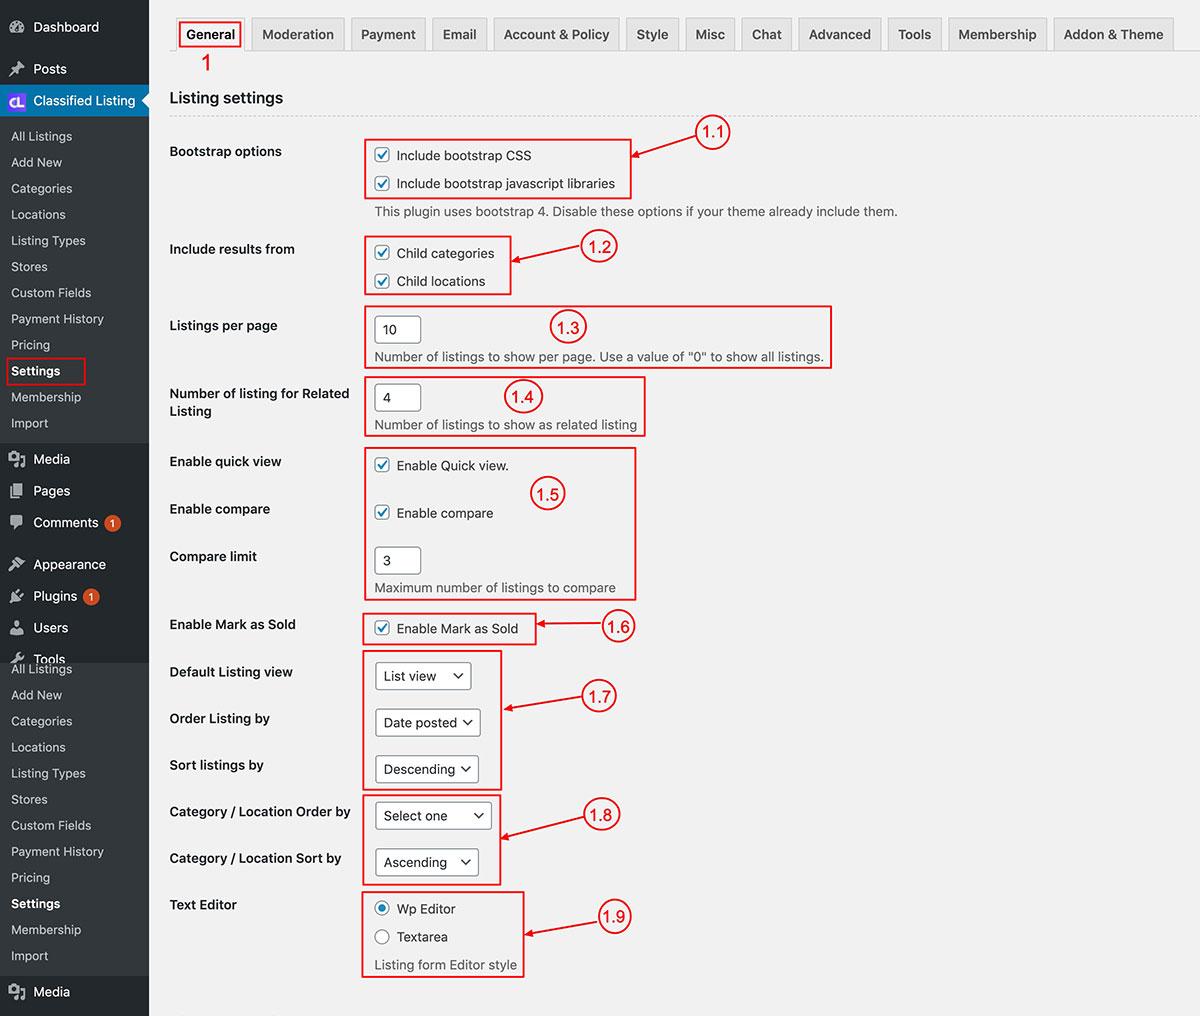 Classified listing settings